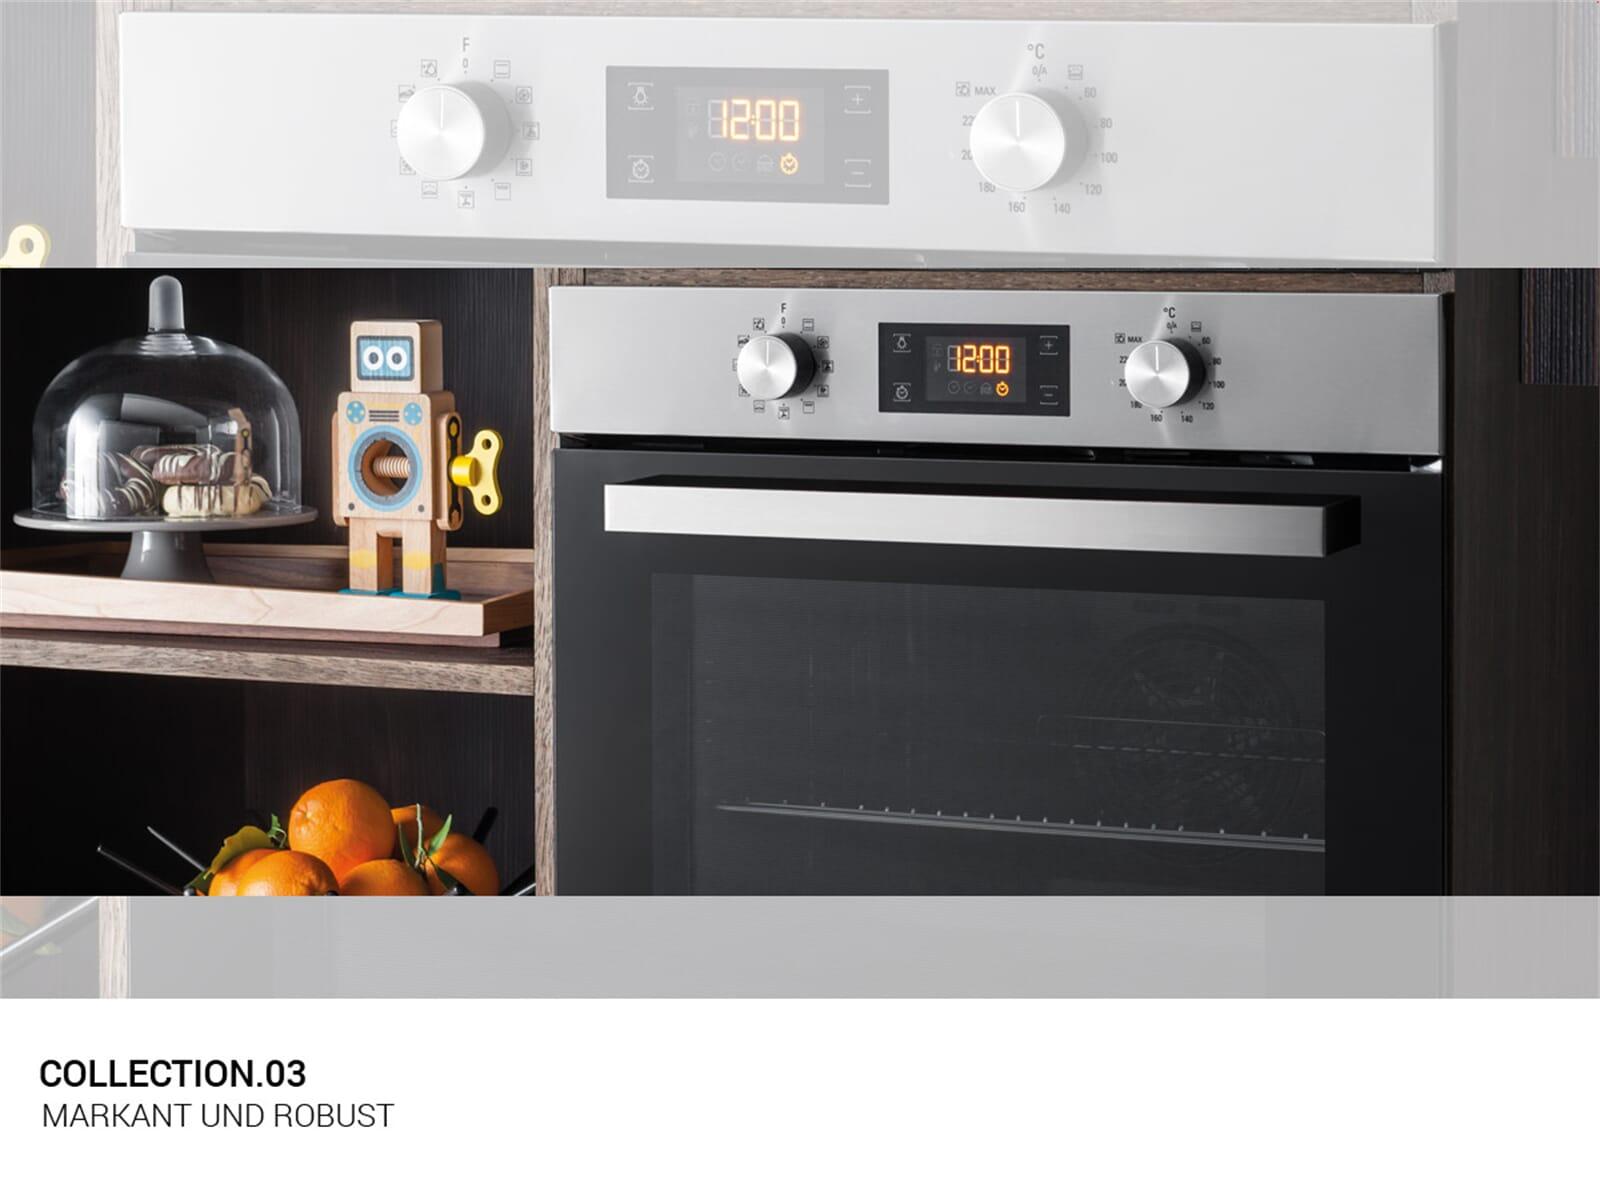 bauknecht empk3 3545 in einbau mikrowelle edelstahl. Black Bedroom Furniture Sets. Home Design Ideas